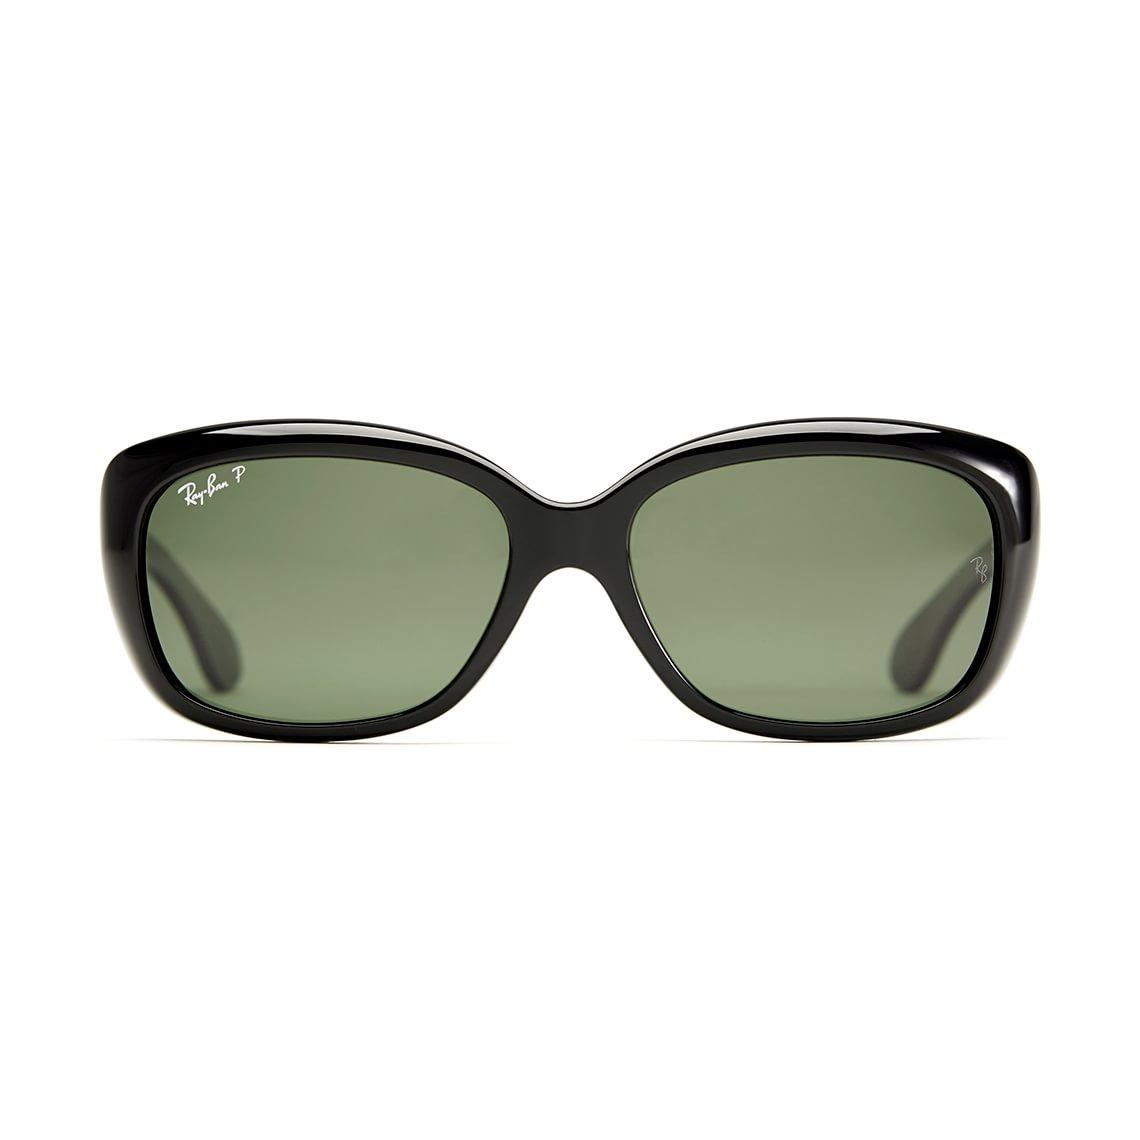 ray ban sonnenbrille rb 4101 603771. Black Bedroom Furniture Sets. Home Design Ideas